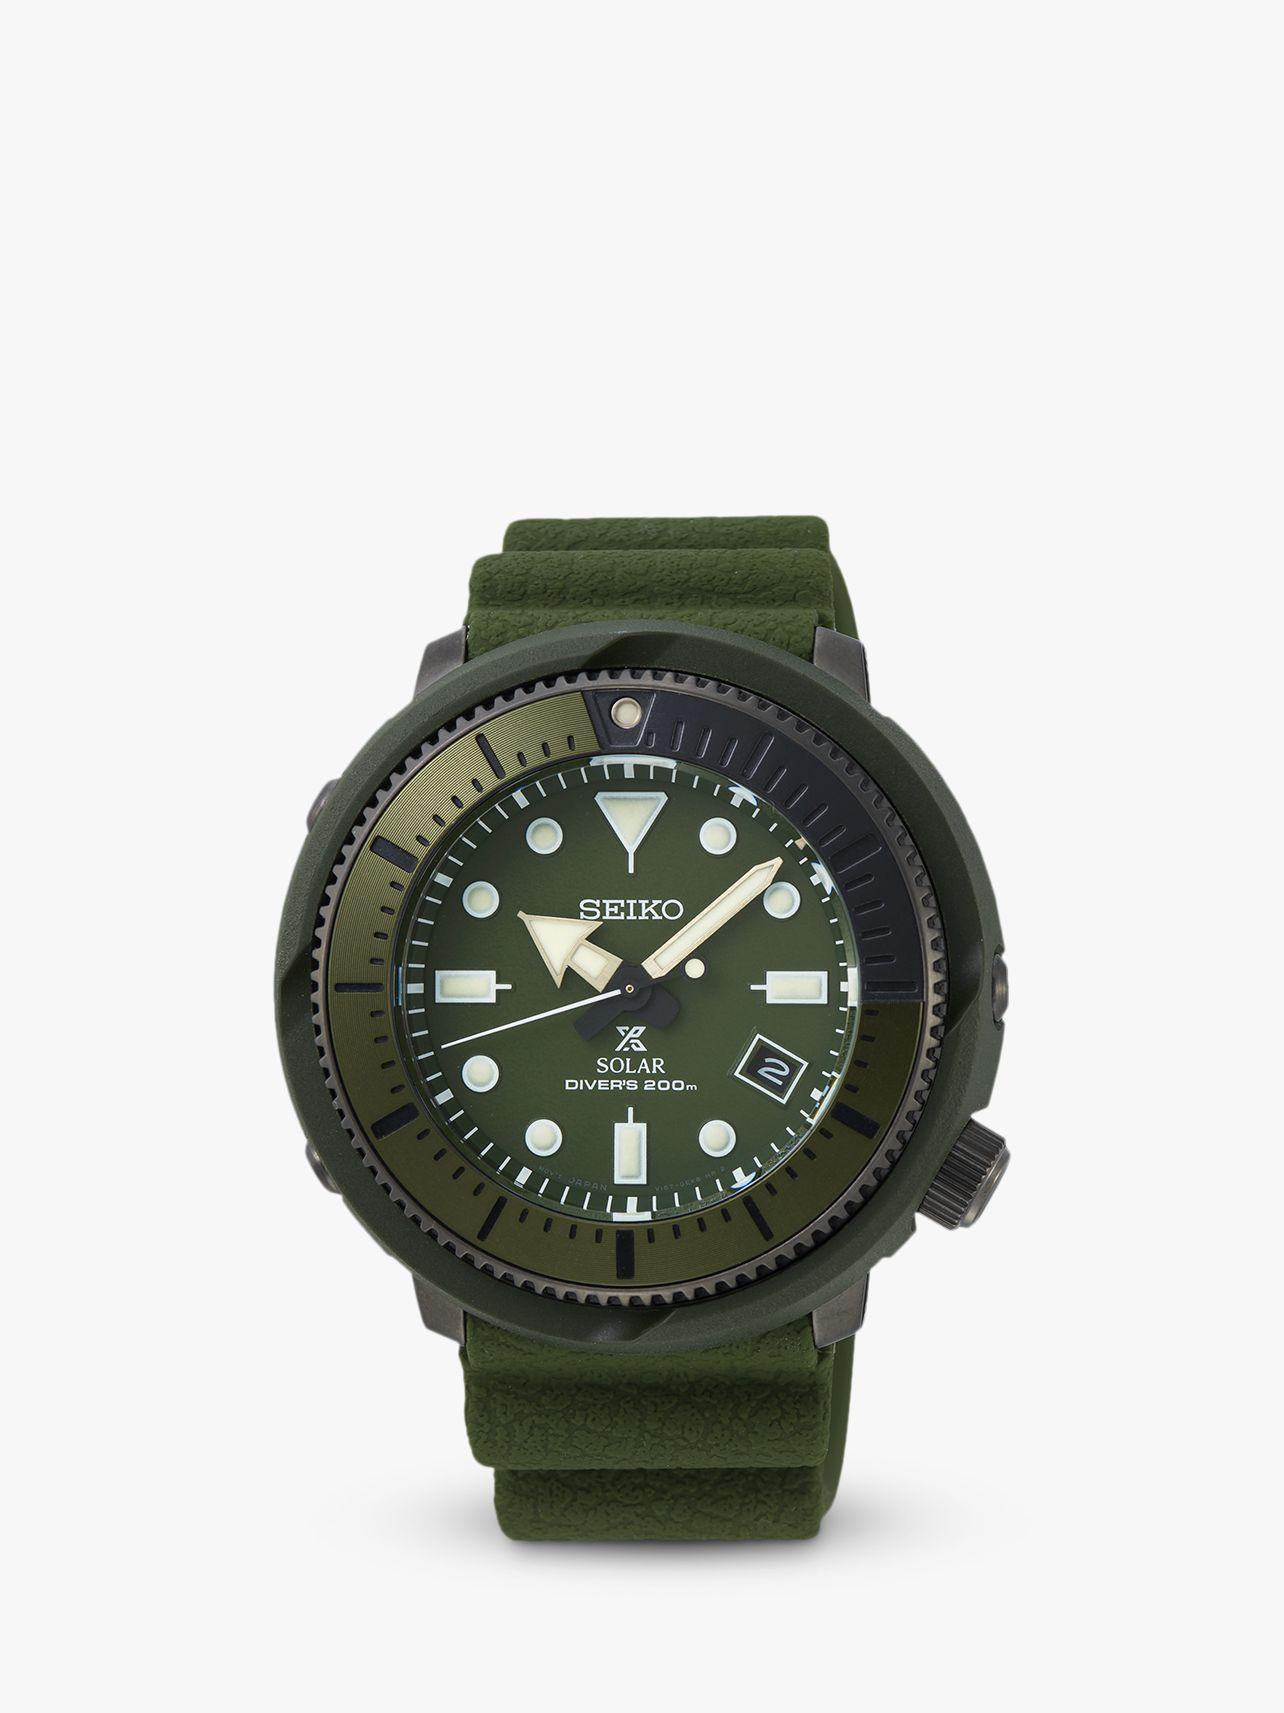 Seiko Seiko Men's Prospex Date Silicone Strap Watch